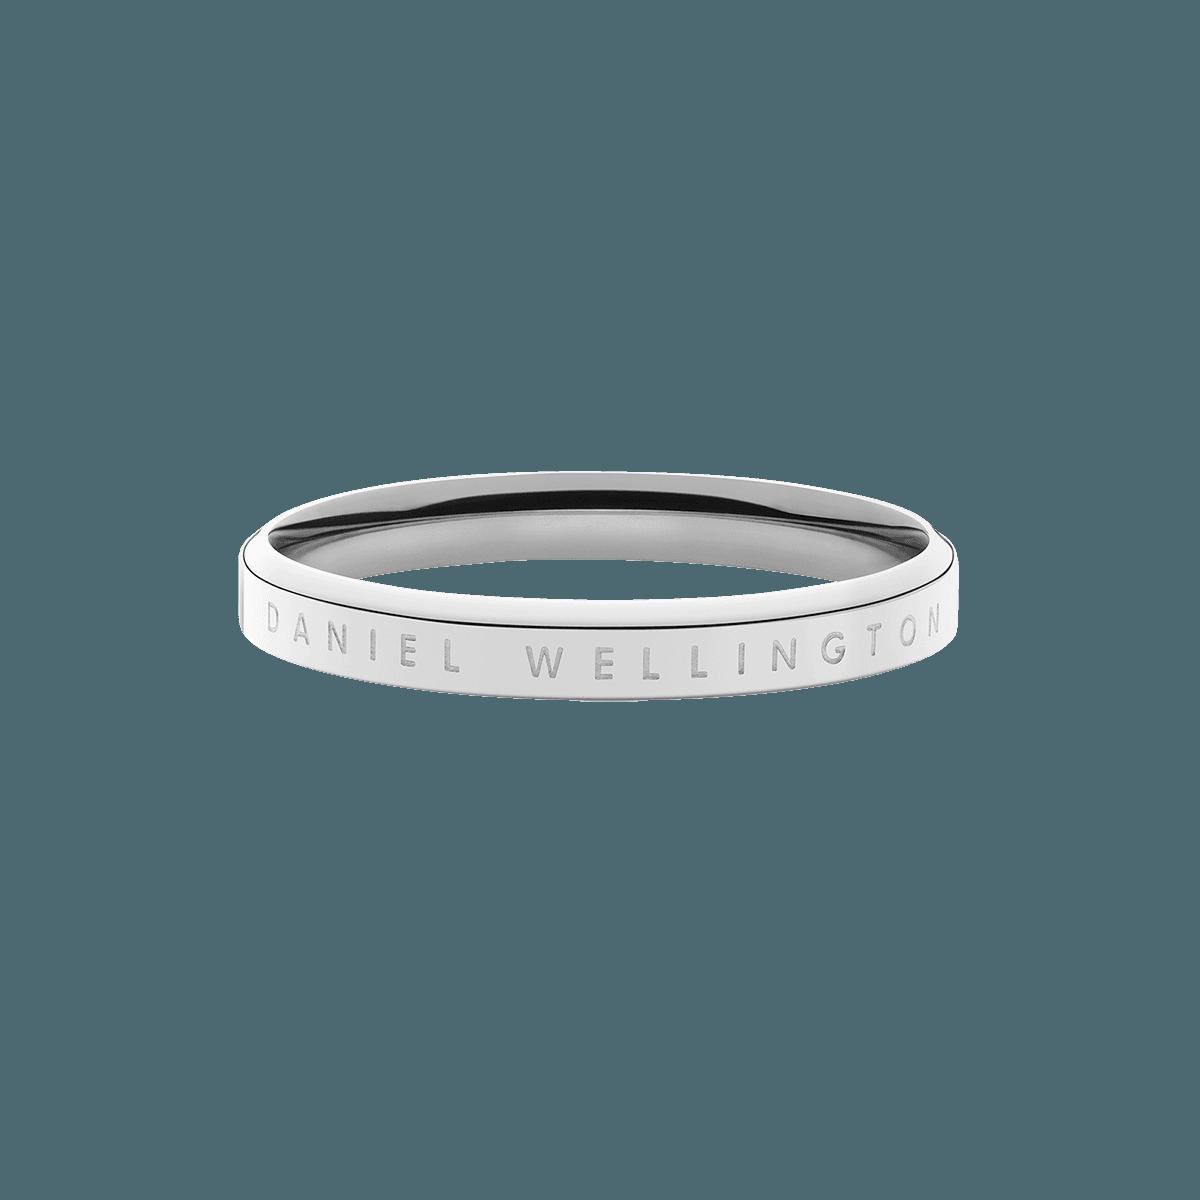 dw官网 dw手表官网 dw中国官网 dw官方旗舰店 DW DW官网  Classic Ring Silver 68mm